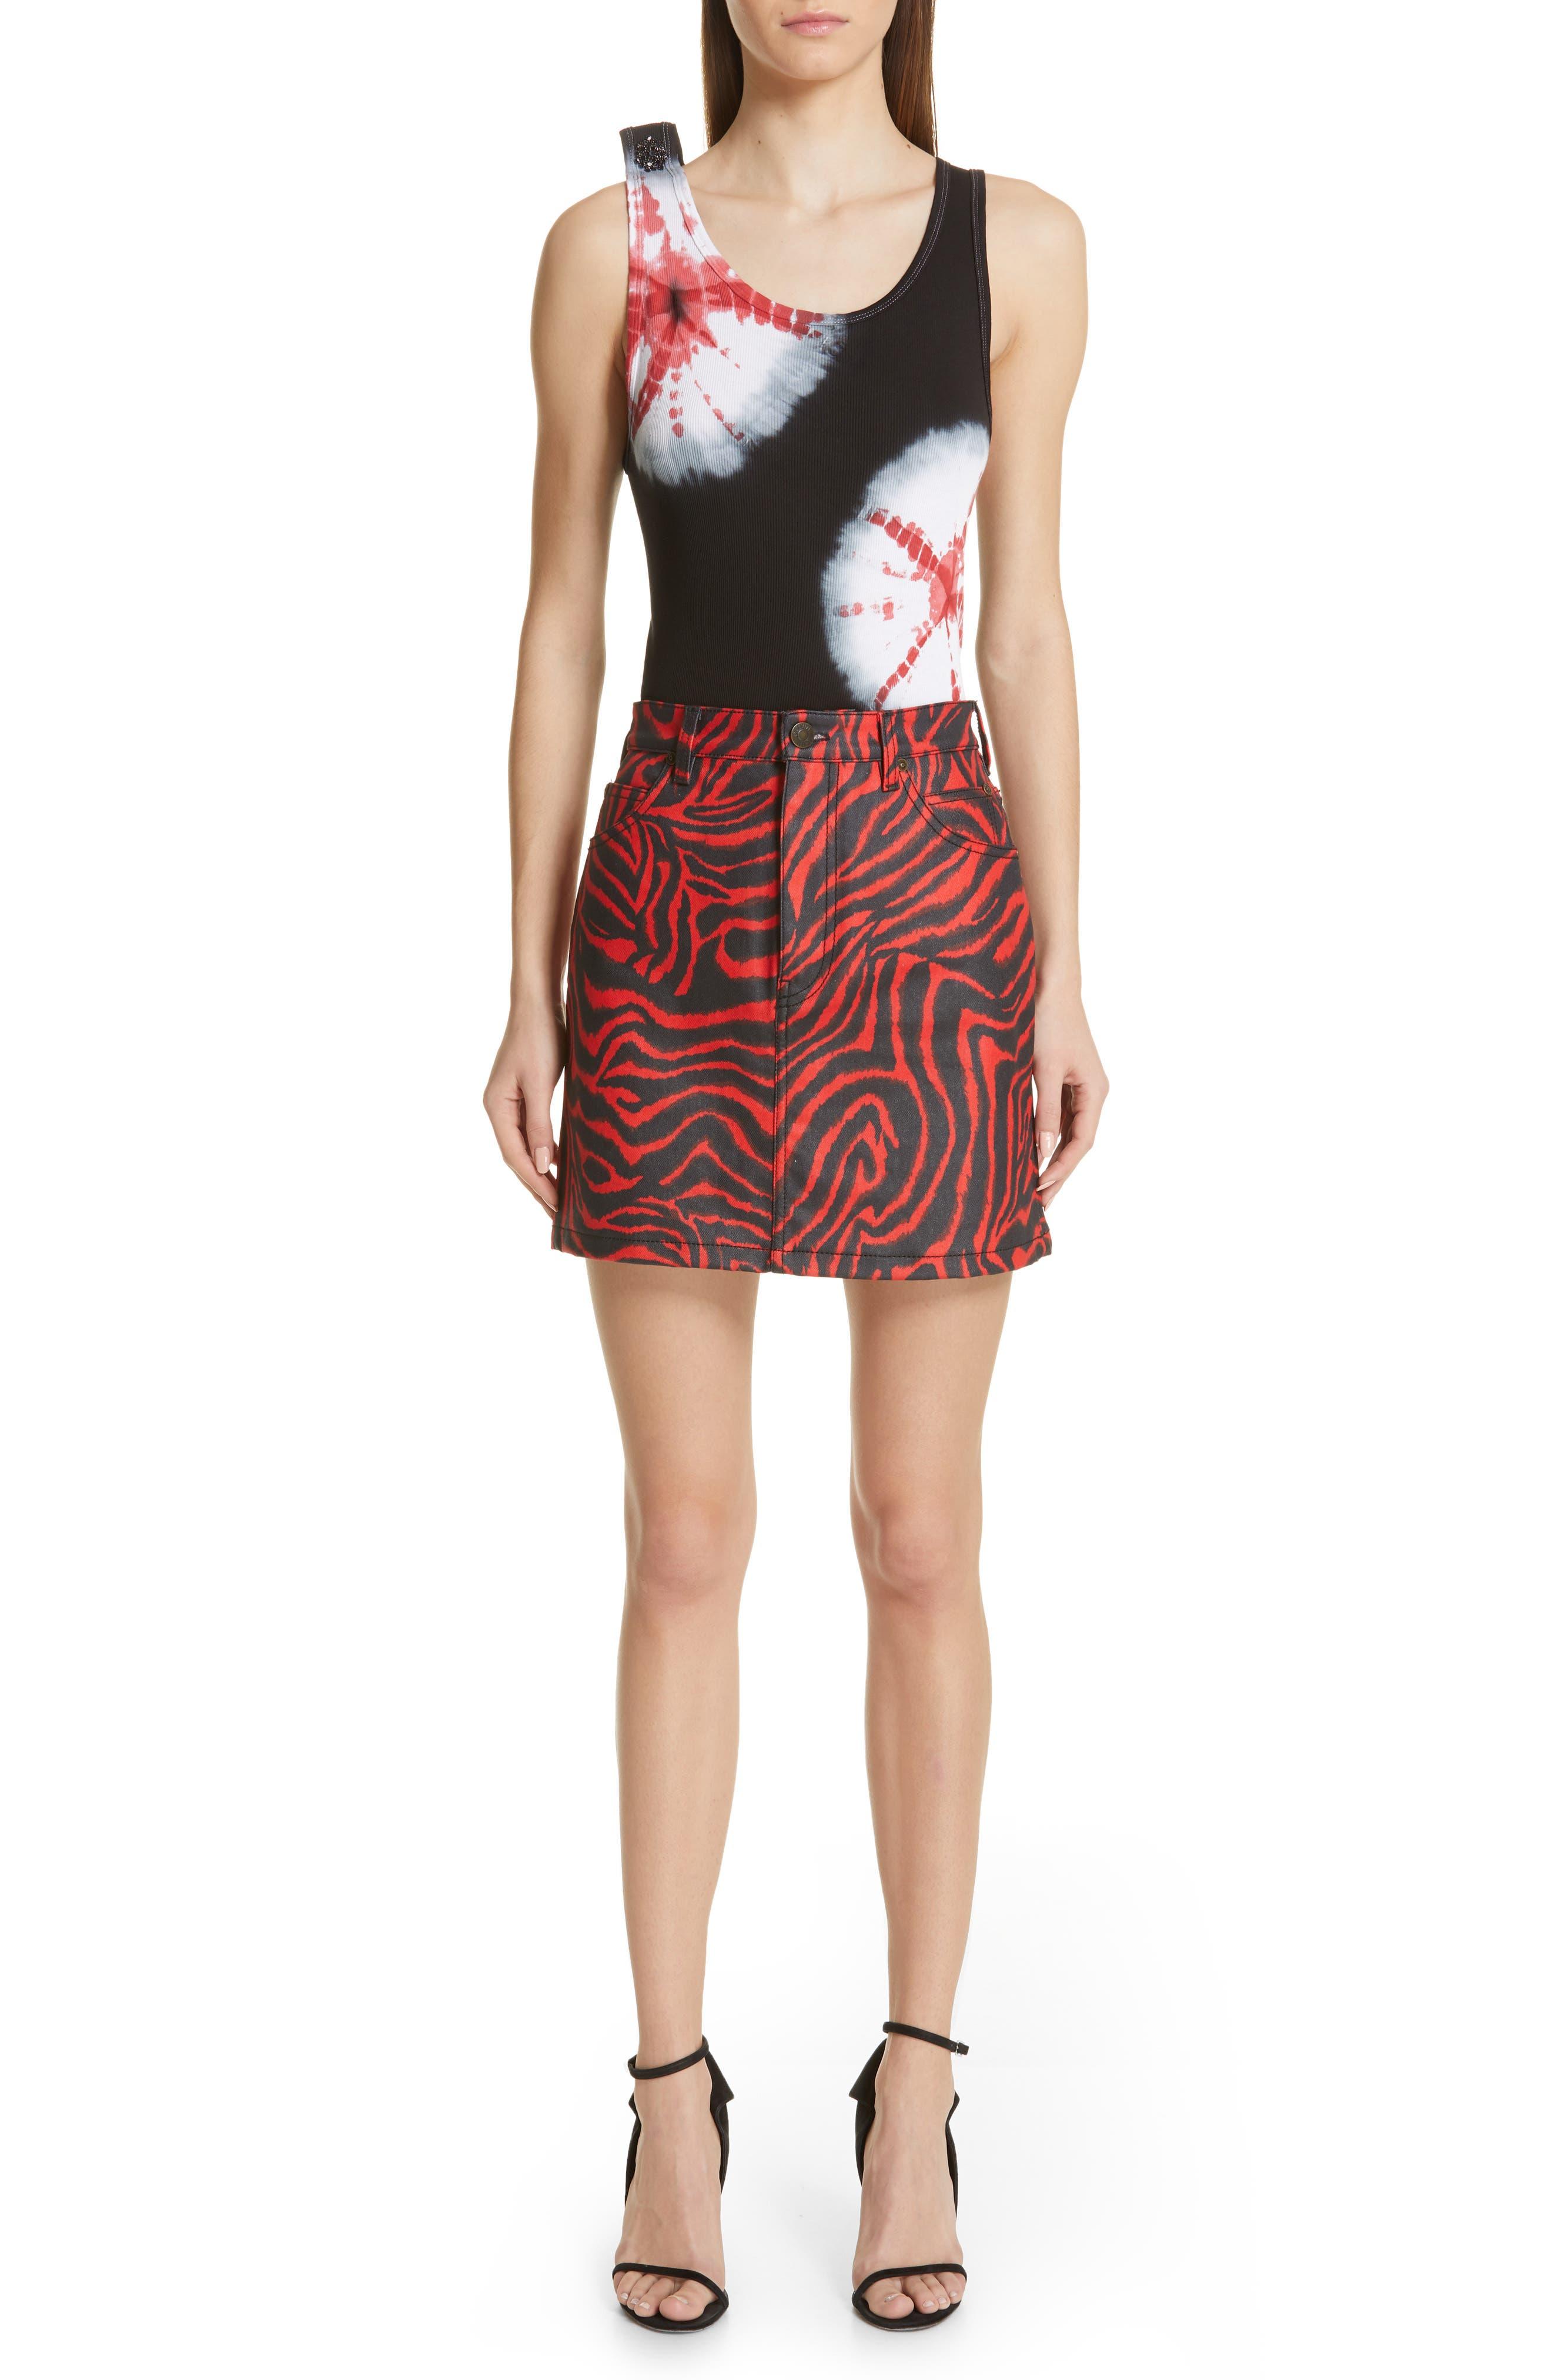 CALVIN KLEIN 205W39NYC, Zebra Print Denim Skirt, Alternate thumbnail 7, color, RED ZEBRA